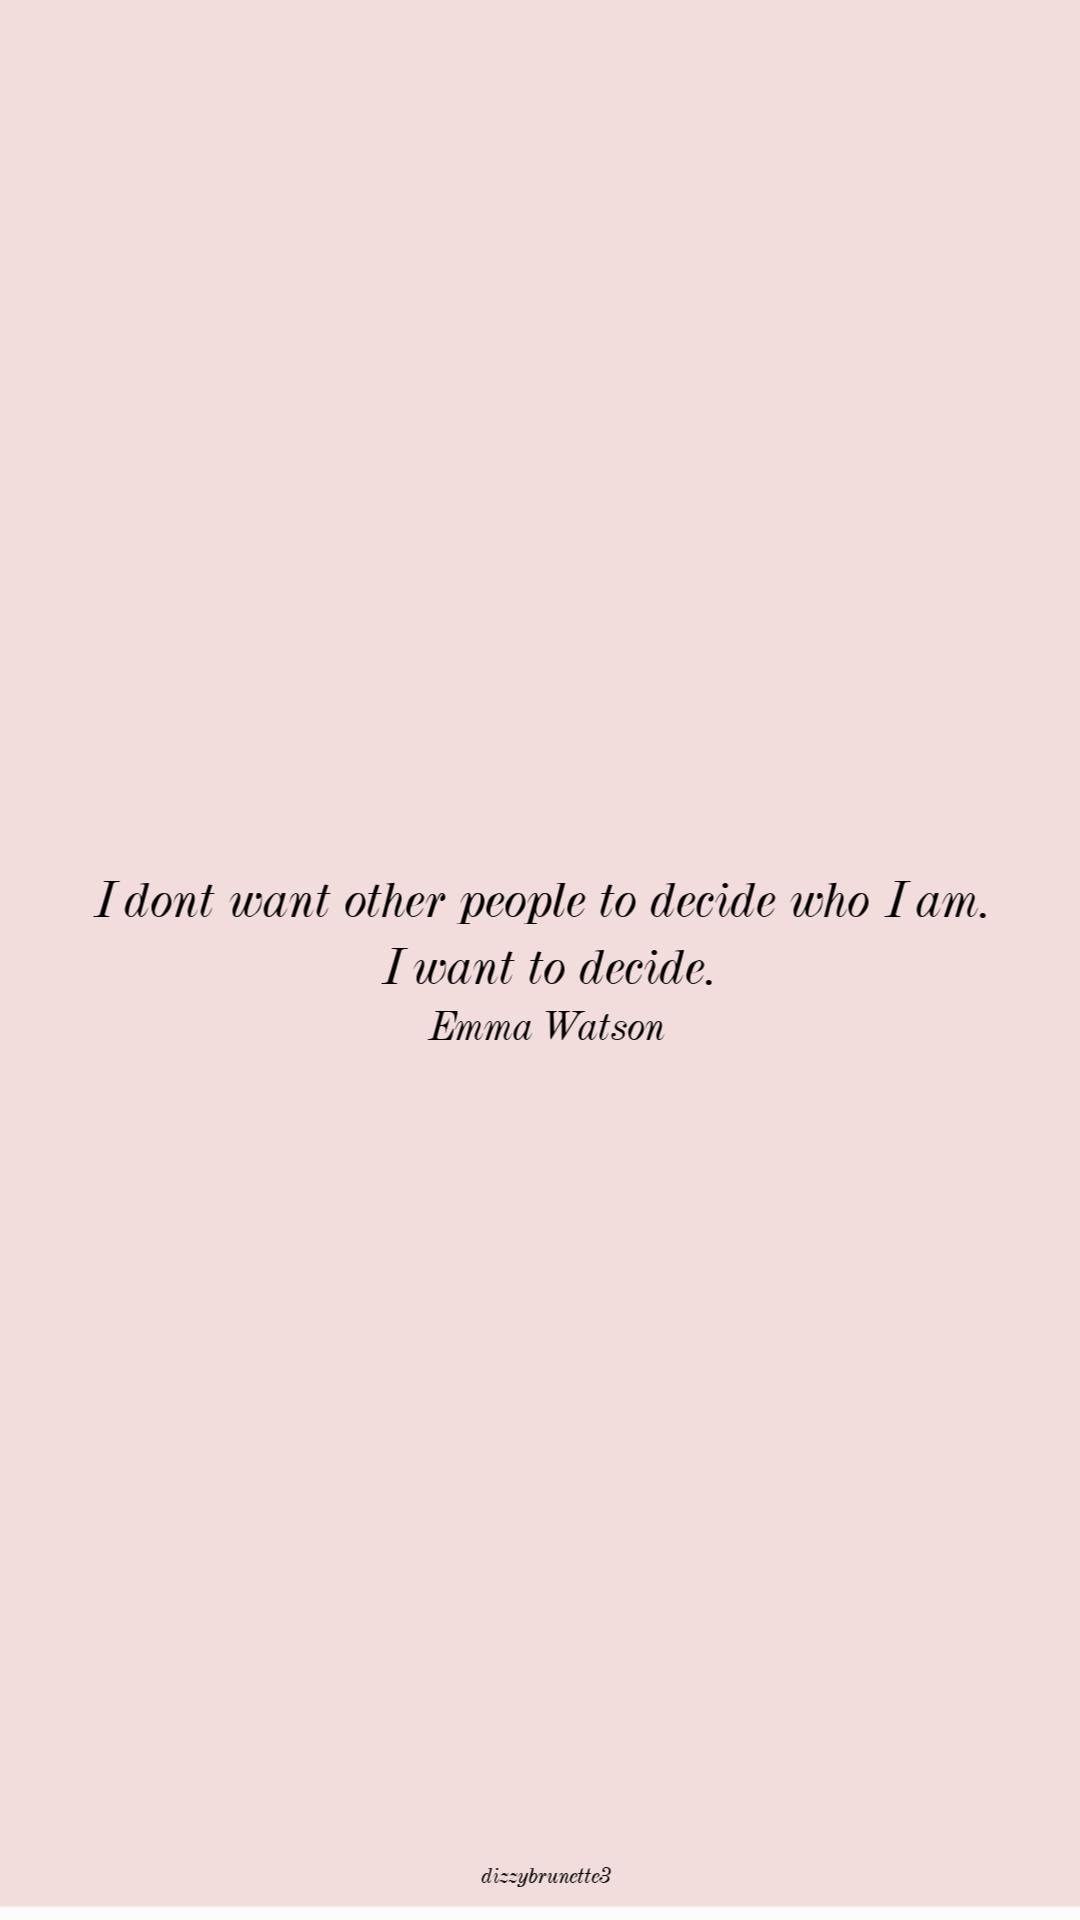 I want to decide who I am #selfpower #believeinyou #inspirationalphonewallpaper